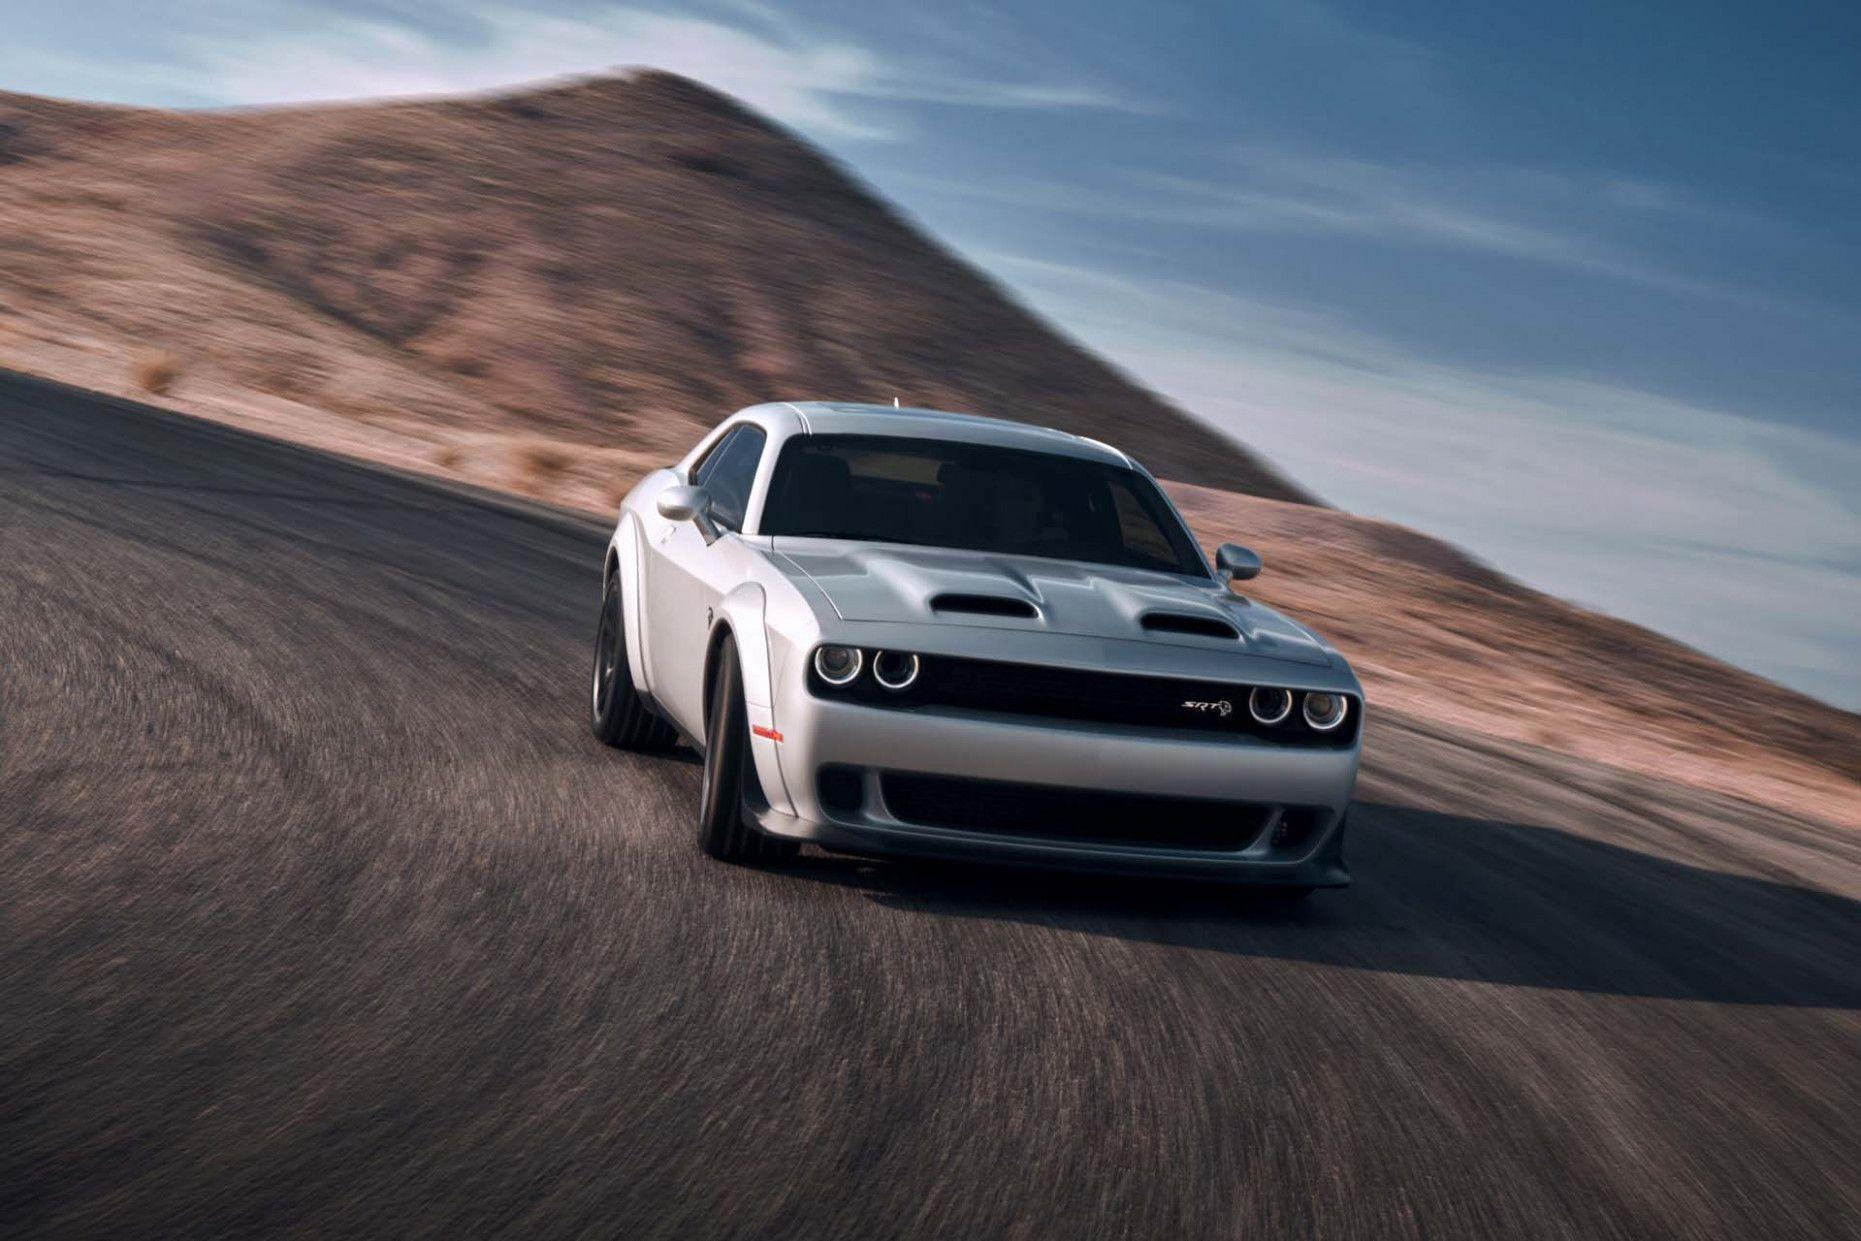 2020 Dodge Barracuda For Sale Release In 2020 Dodge Challenger Challenger Srt Hellcat Dodge Challenger Srt Hellcat